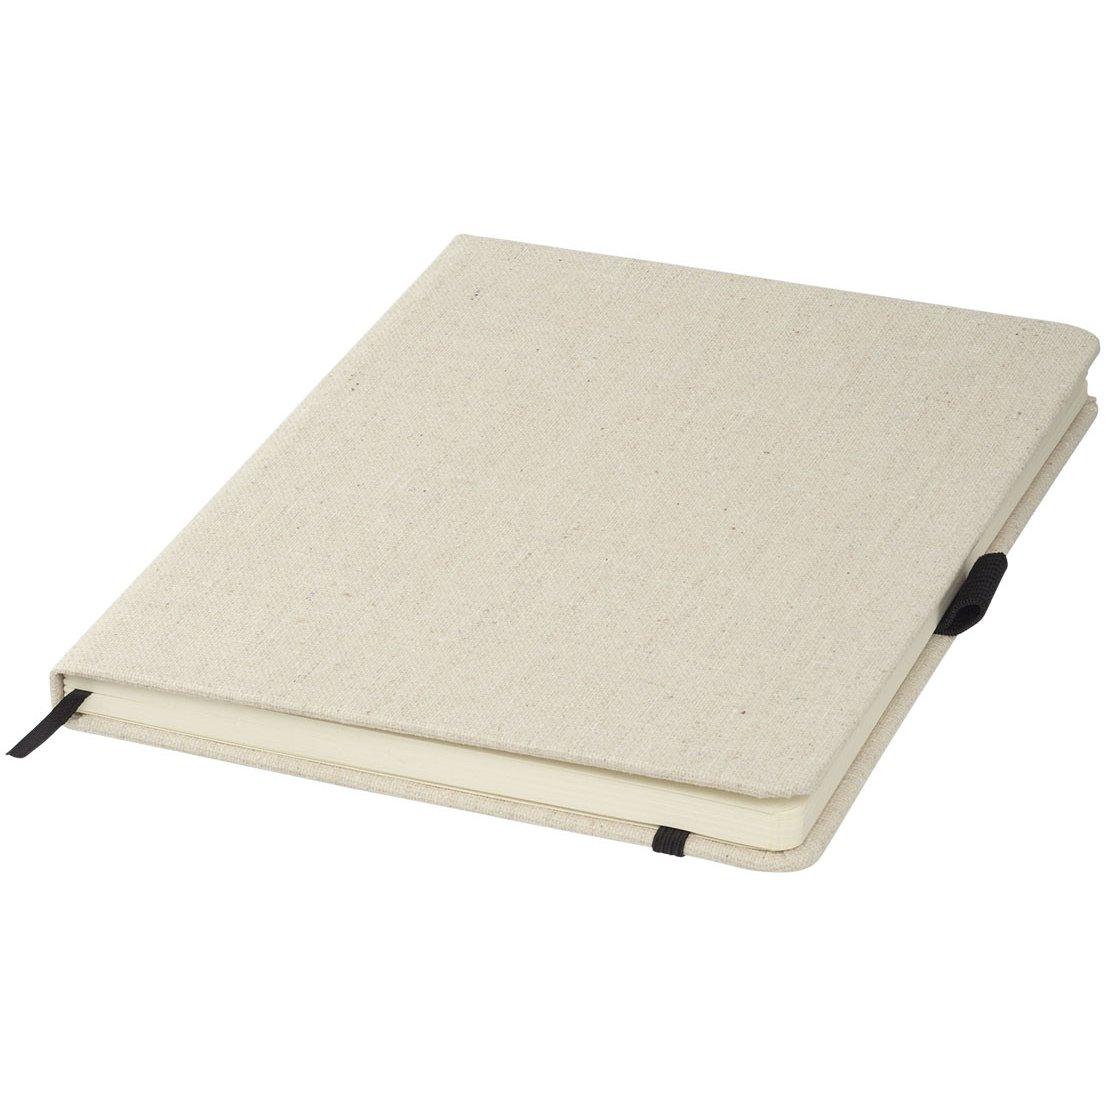 Bullet Luna A5 notebook, ruled